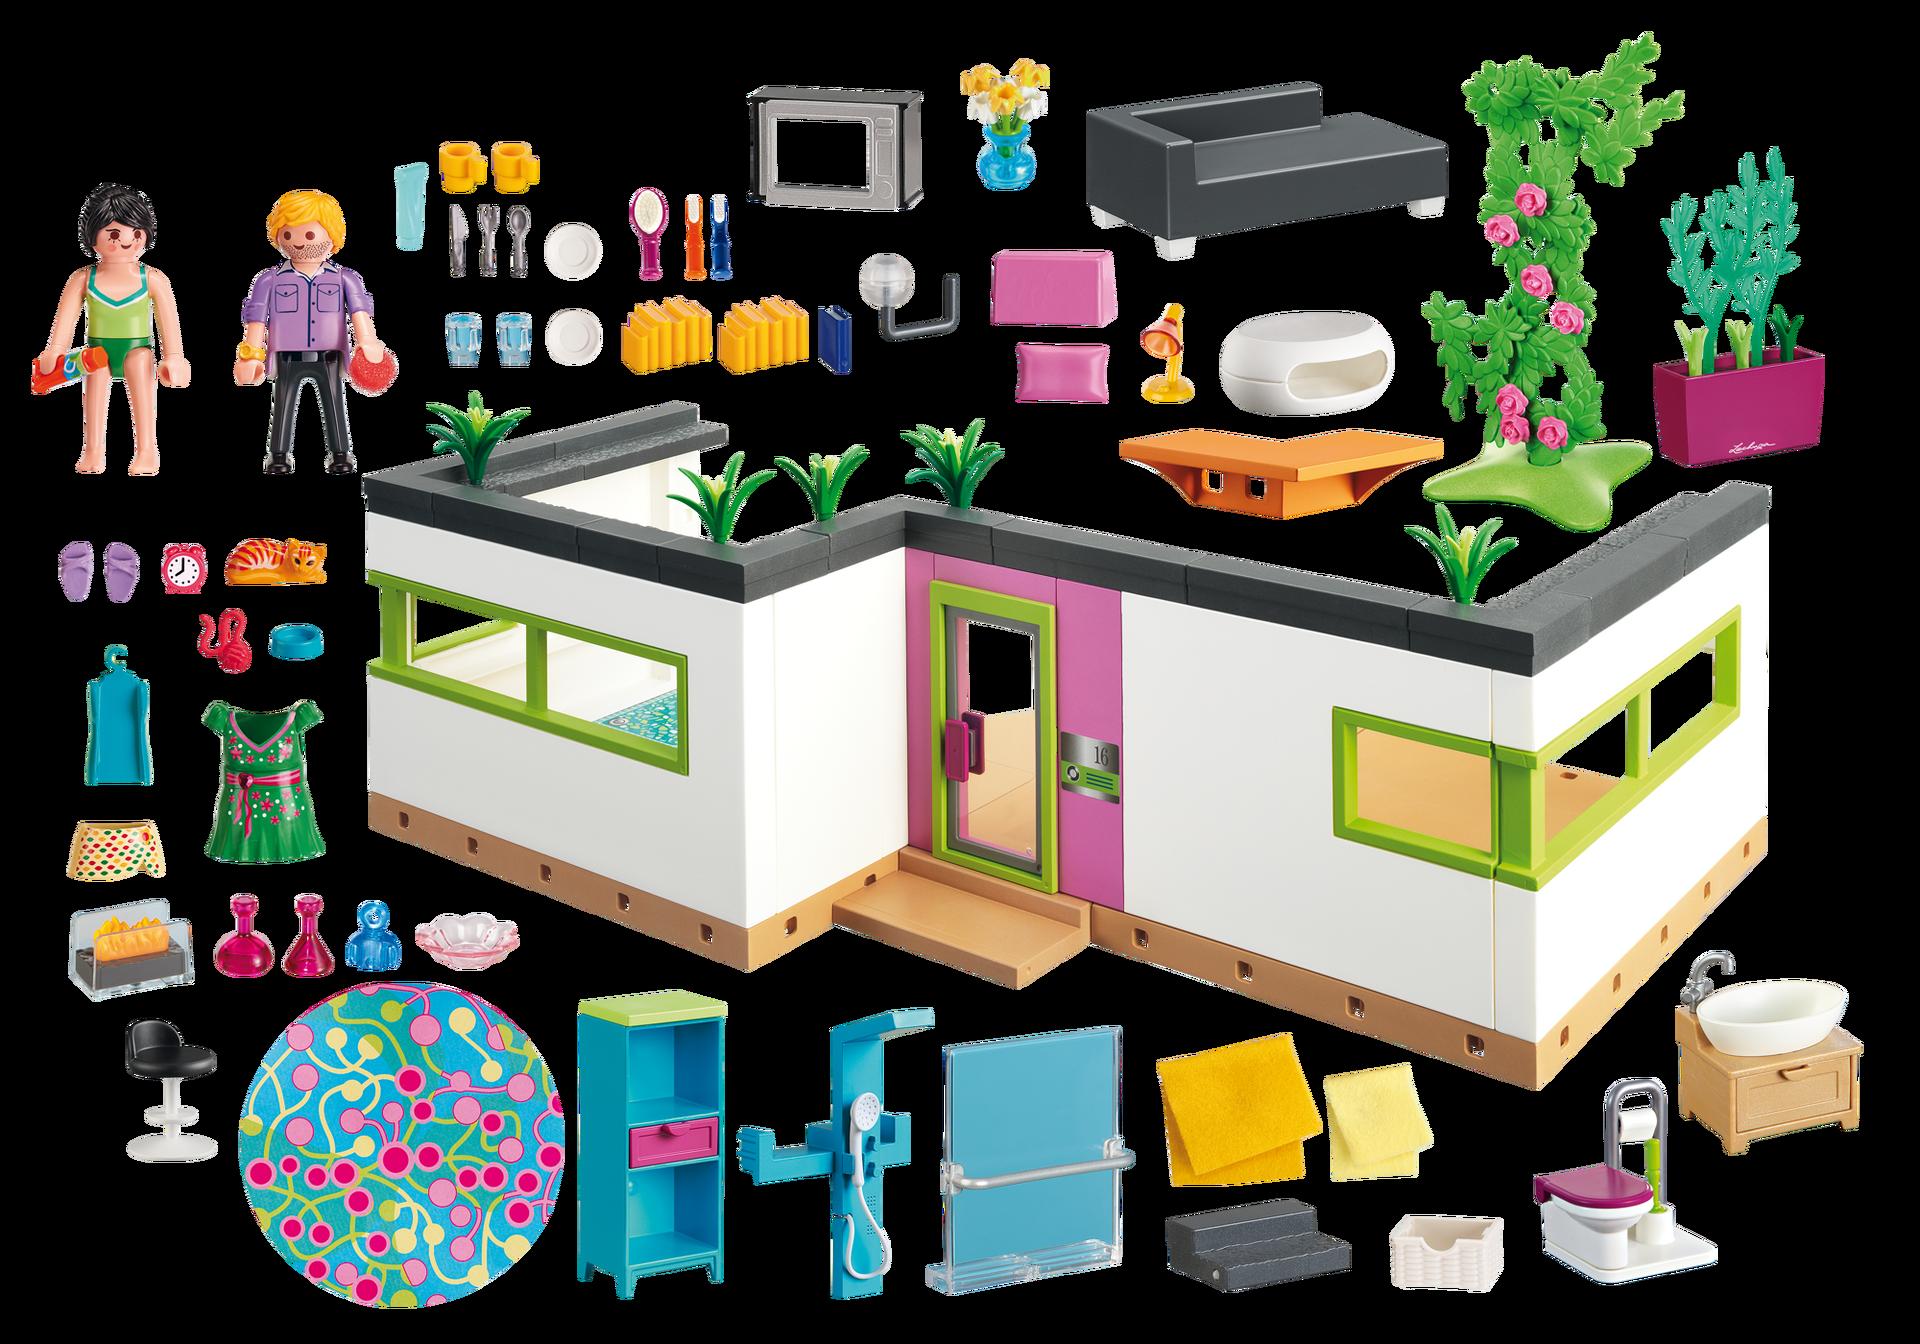 Studio des invit s 5586 playmobil france for Maison moderne playmobil 2018